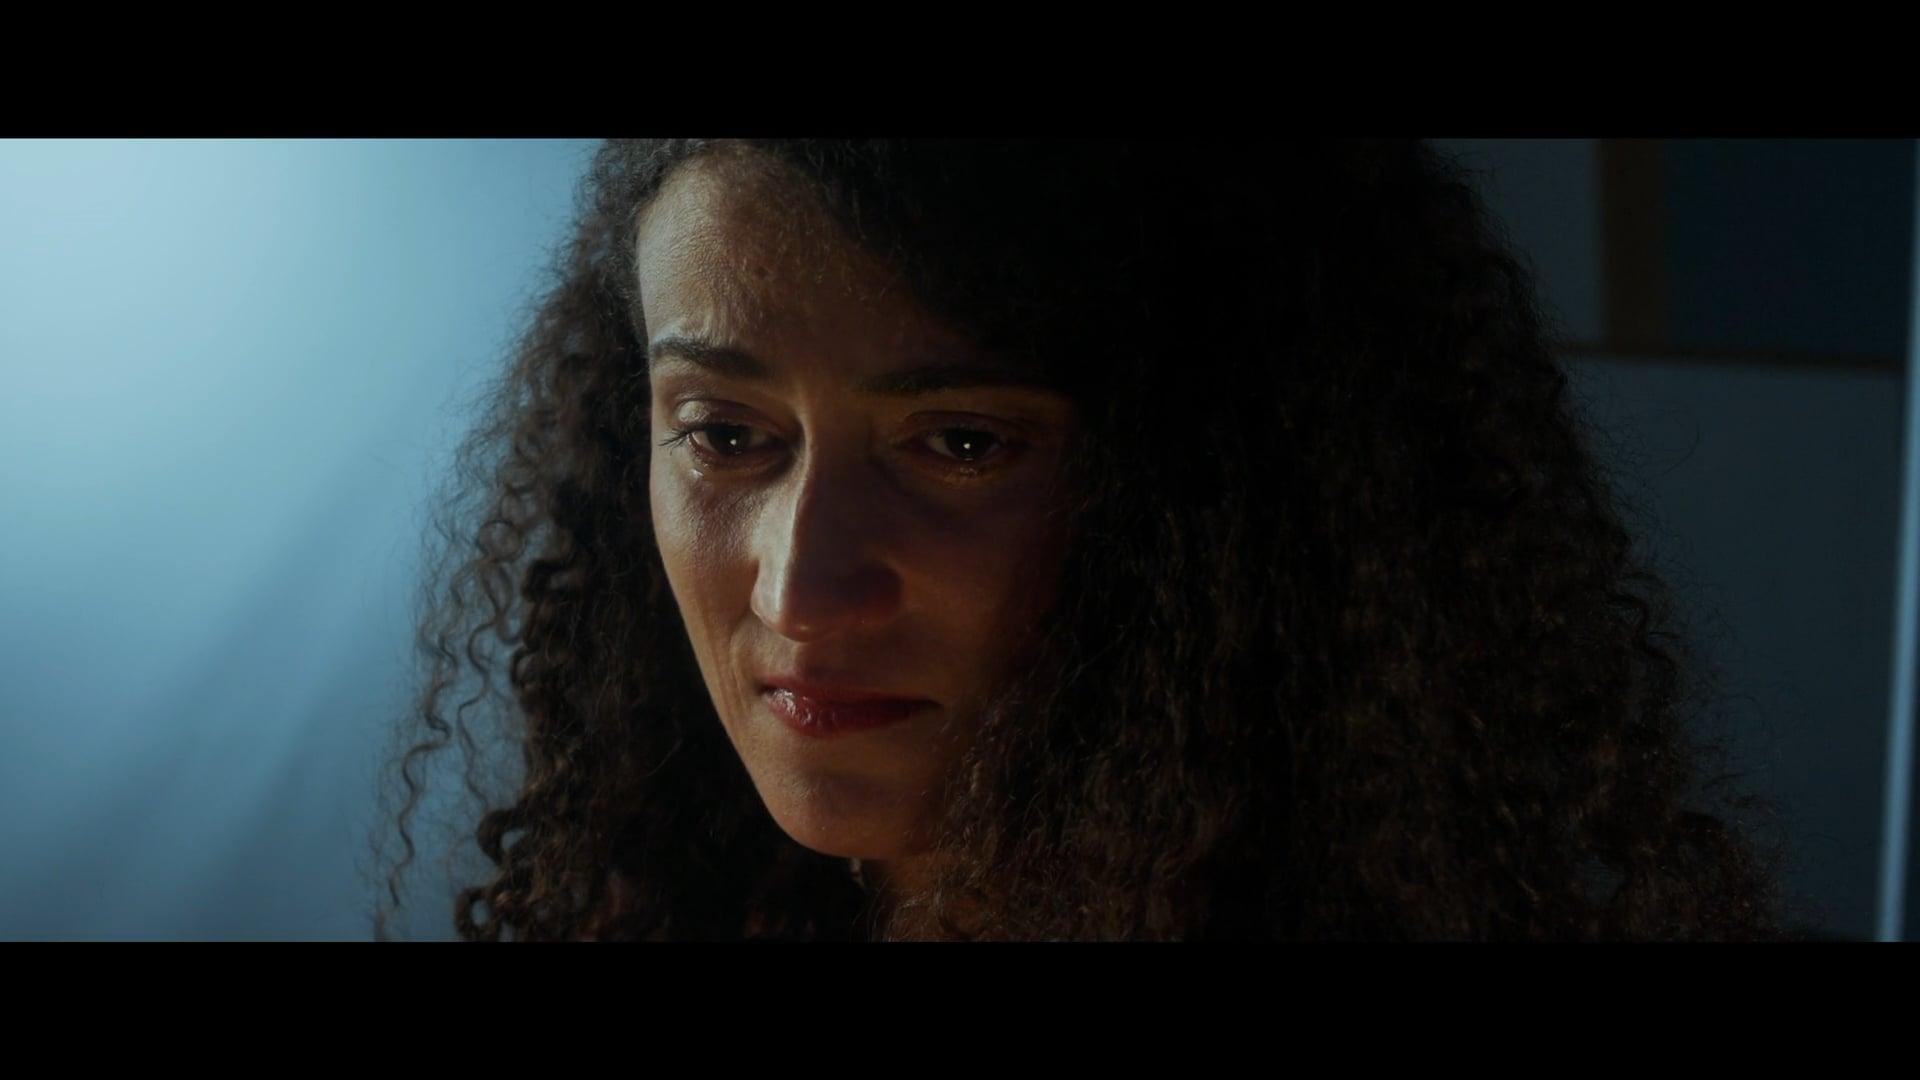 ANA, Short Film, 2018